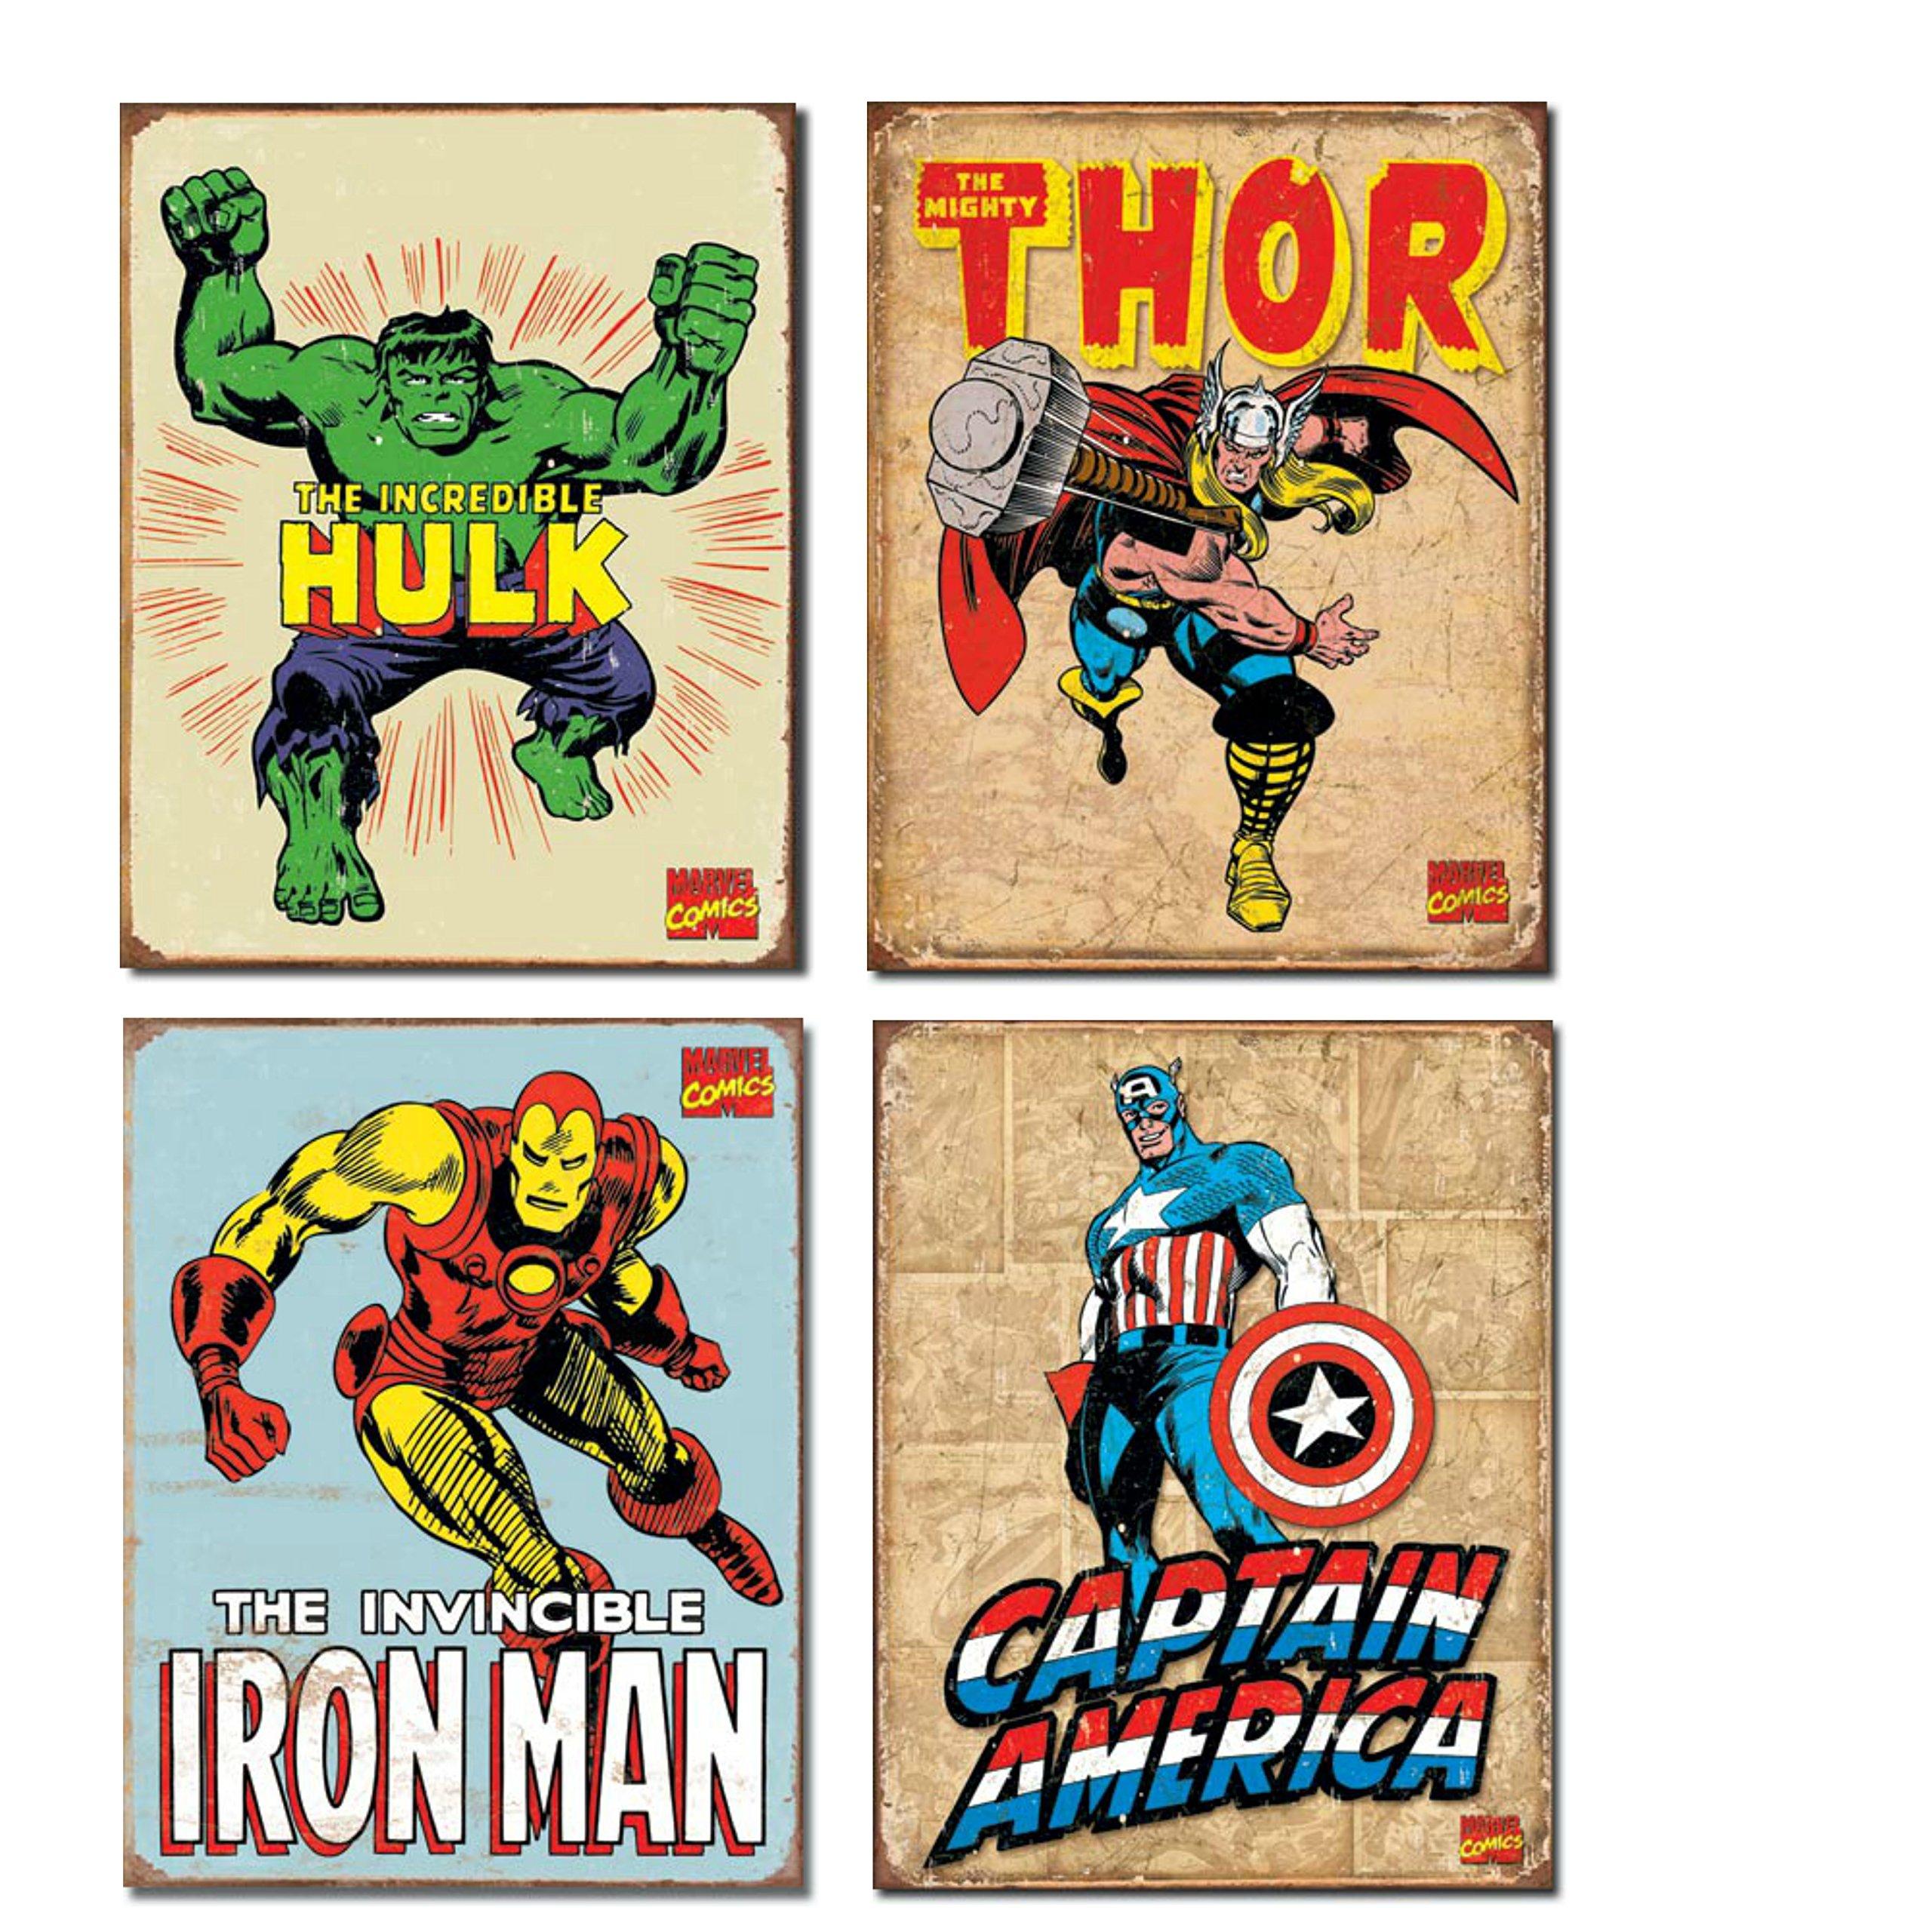 Vintage Superhero Tin Sign Bundle - The Incredible Hulk, Thor, Iron Man and Captain America.